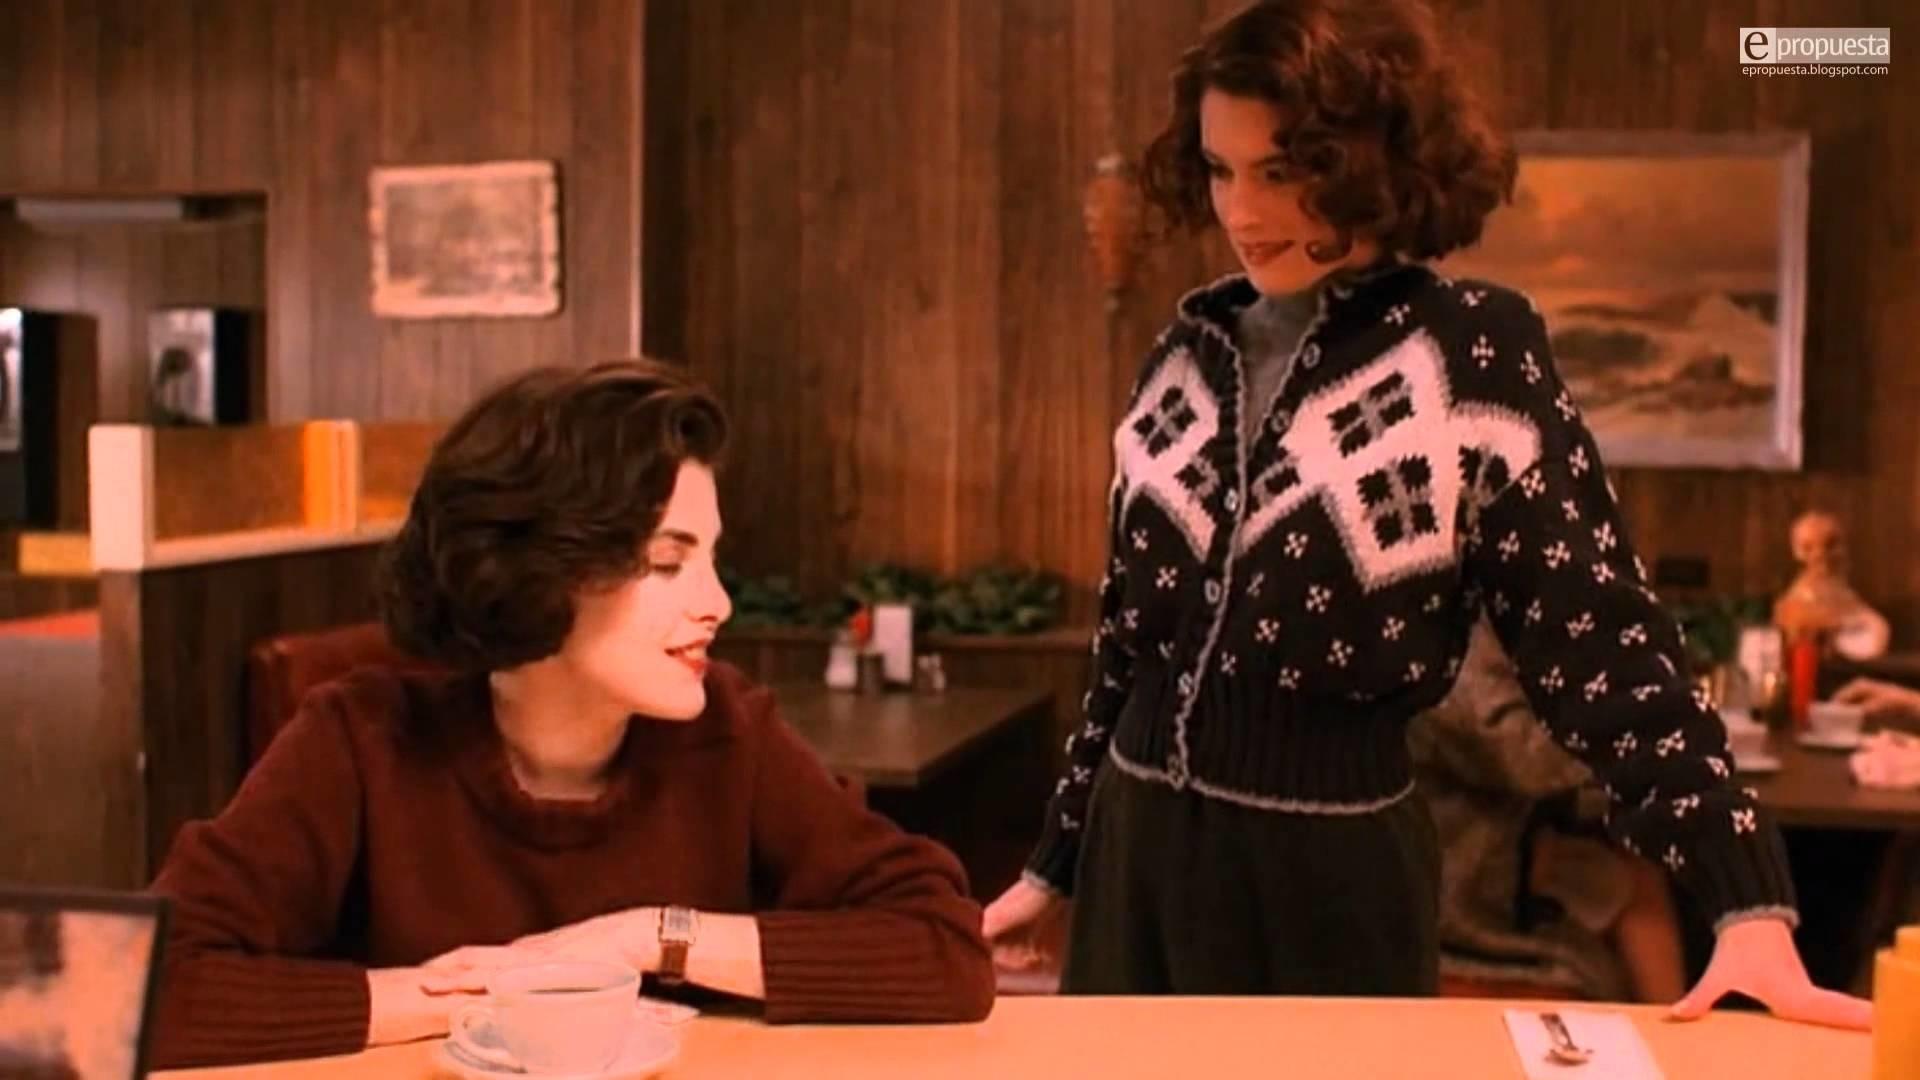 Audrey Horne (Sherilyn Fenn) Twin Peaks Versión española – Spanish version  – YouTube